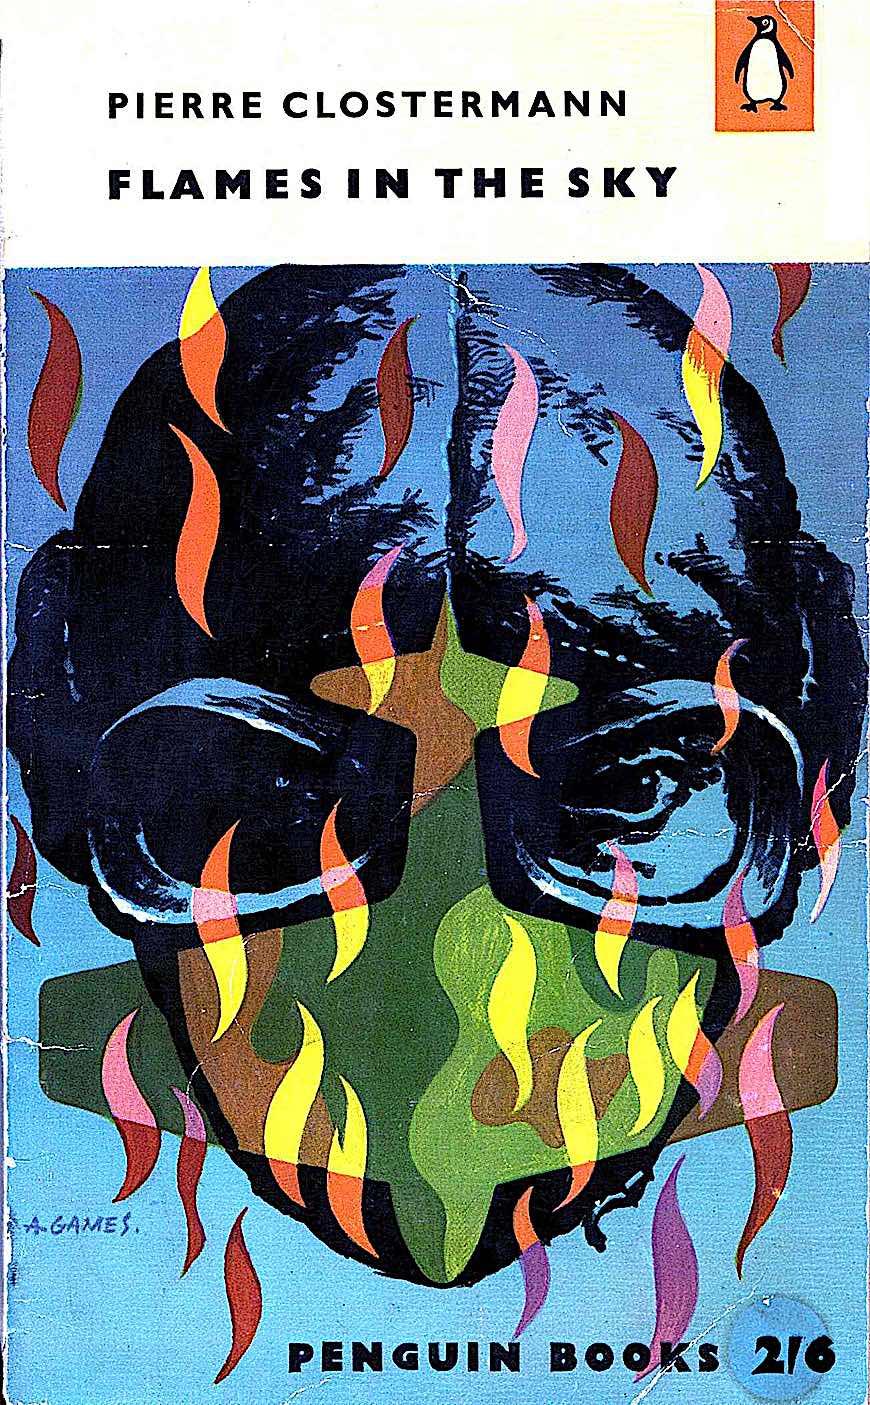 an Abram Games illustration, Penguin Books, Fire in the Sky